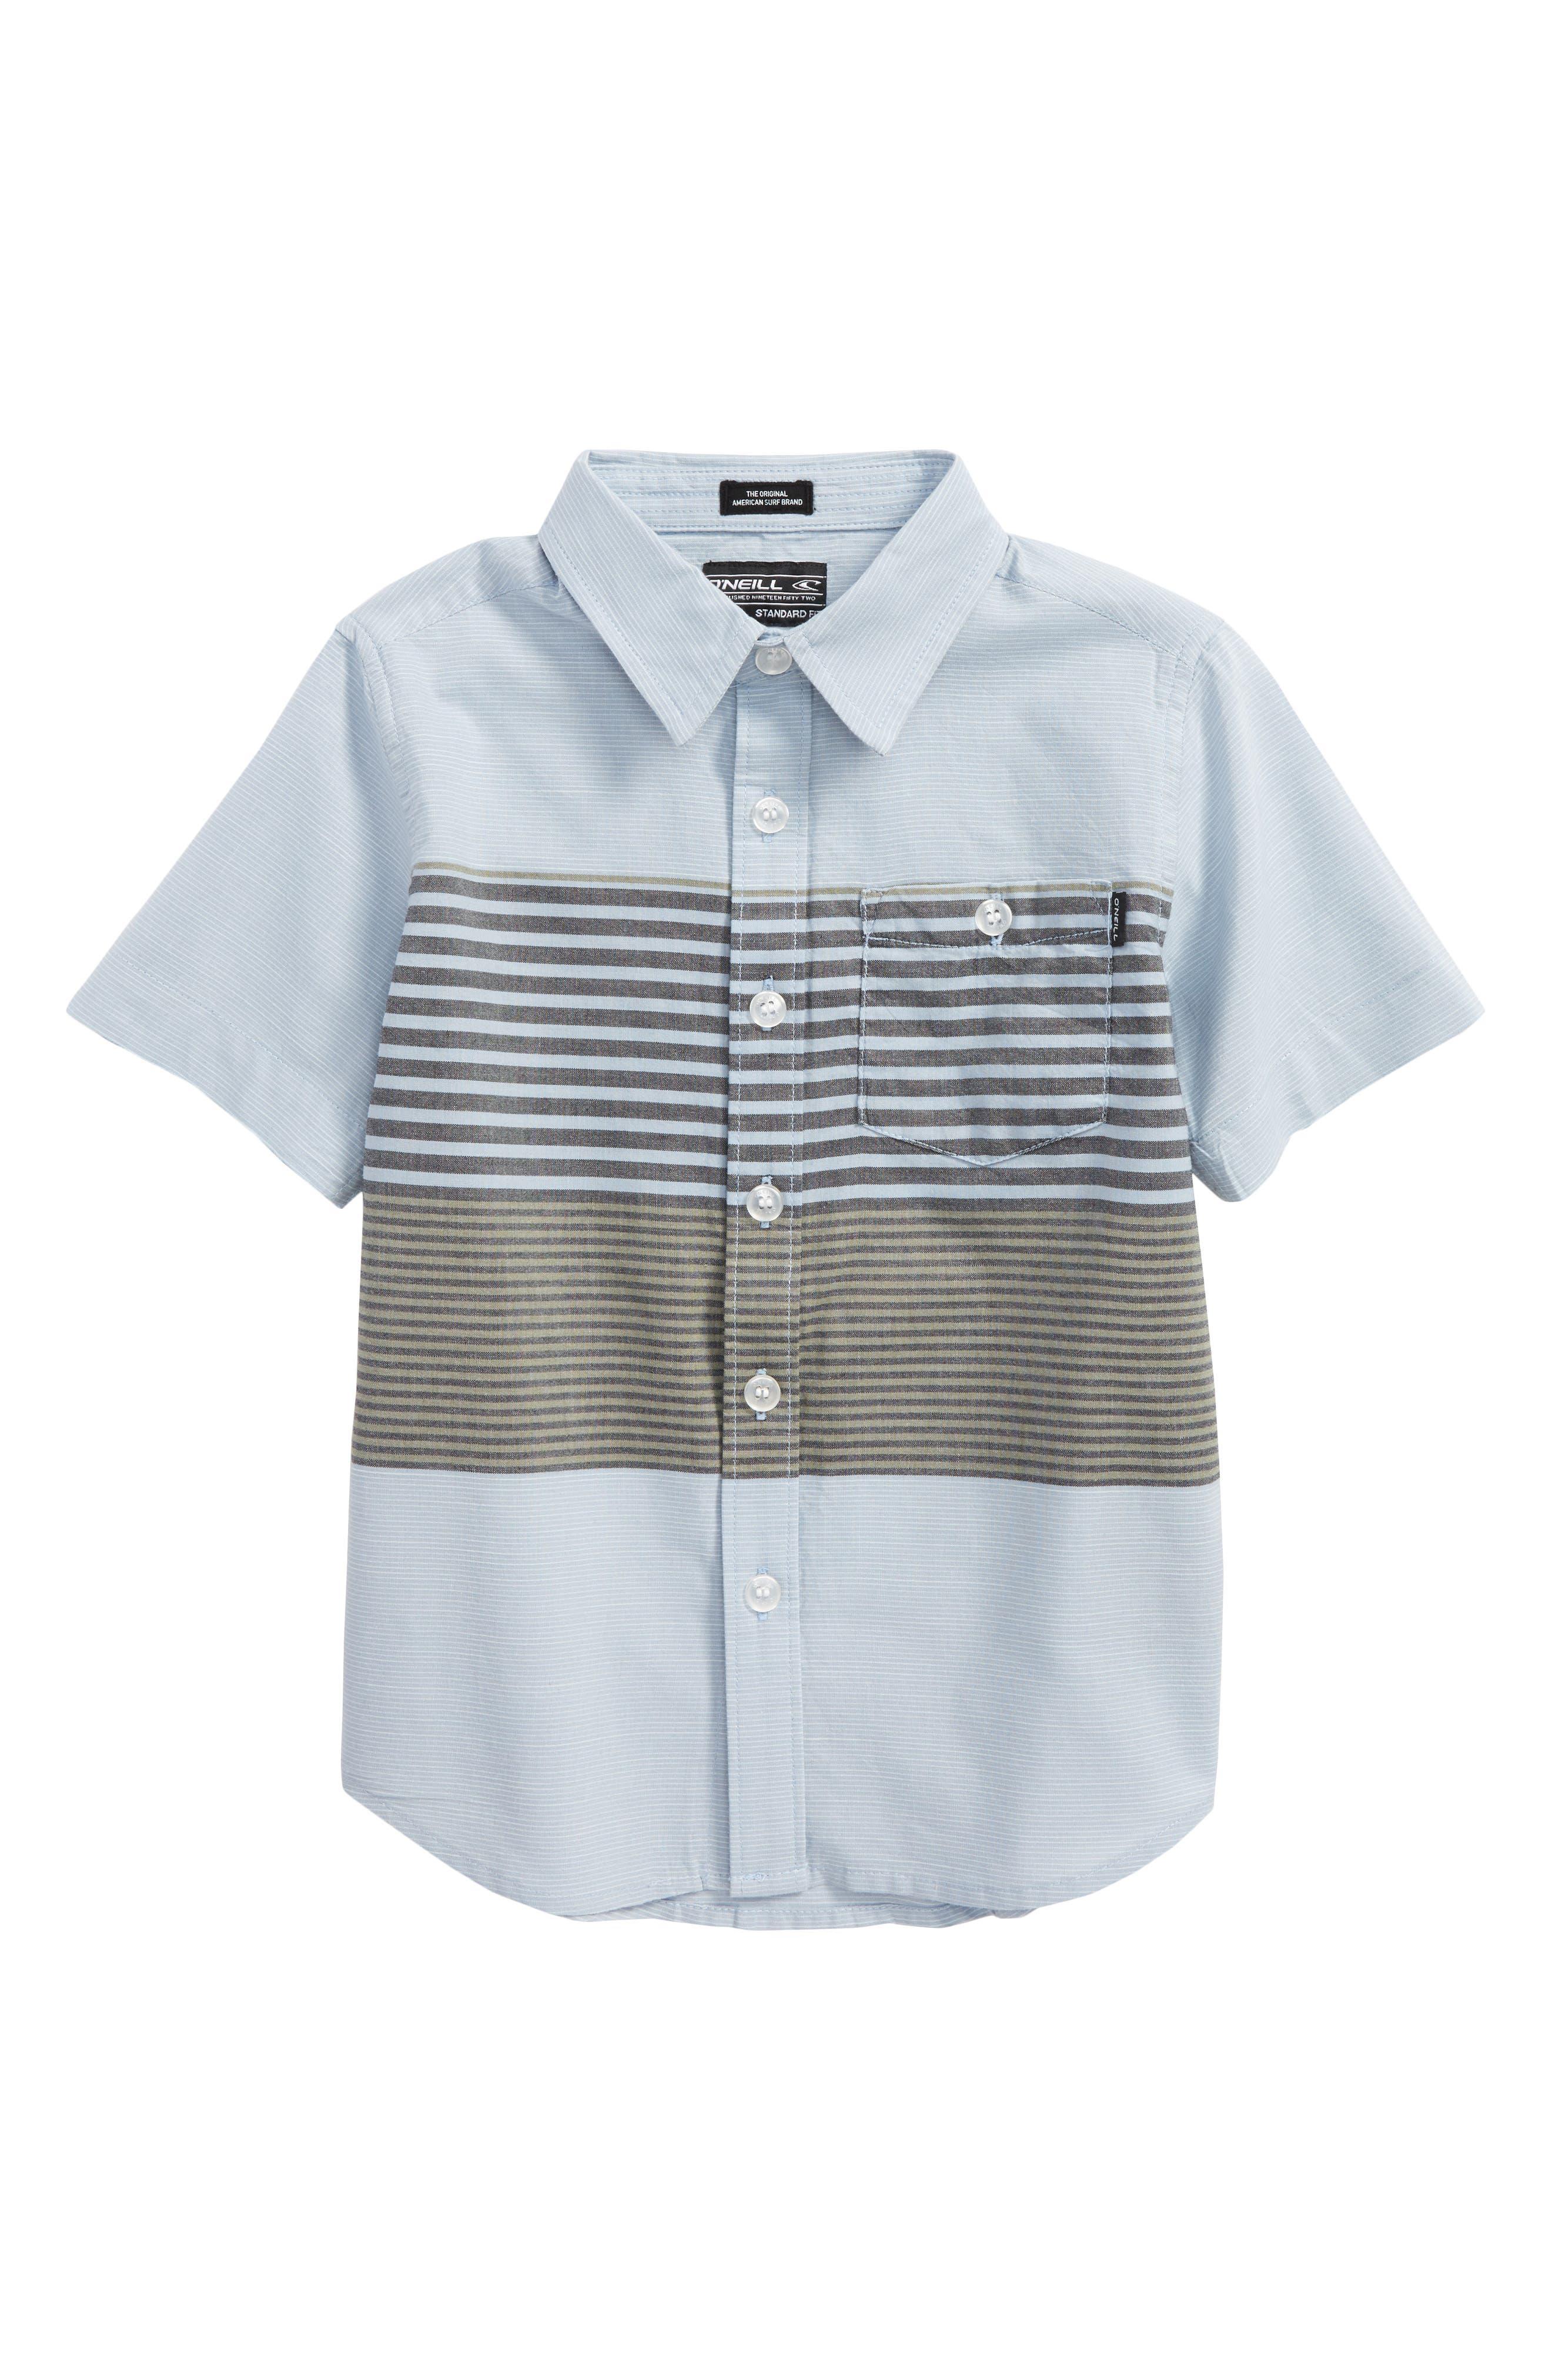 Altair Woven Shirt,                             Main thumbnail 1, color,                             450